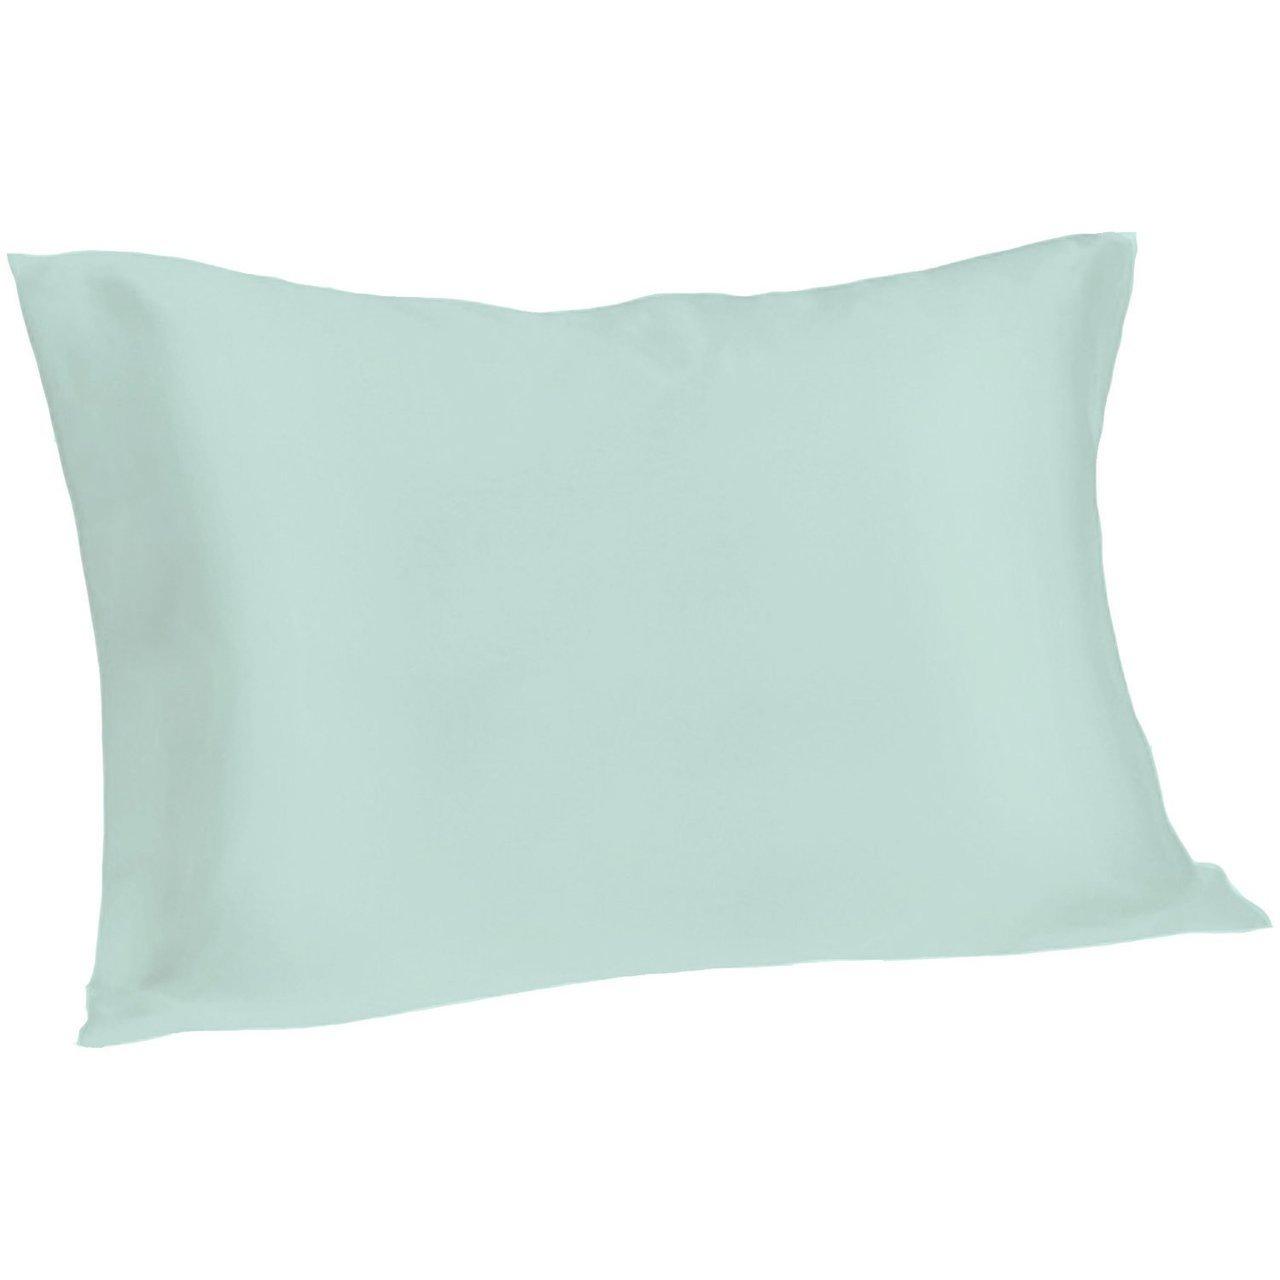 Spasilk 100% Pure Silk Pillowcase for Facial Beauty and Hair Health, King Size, Aqua